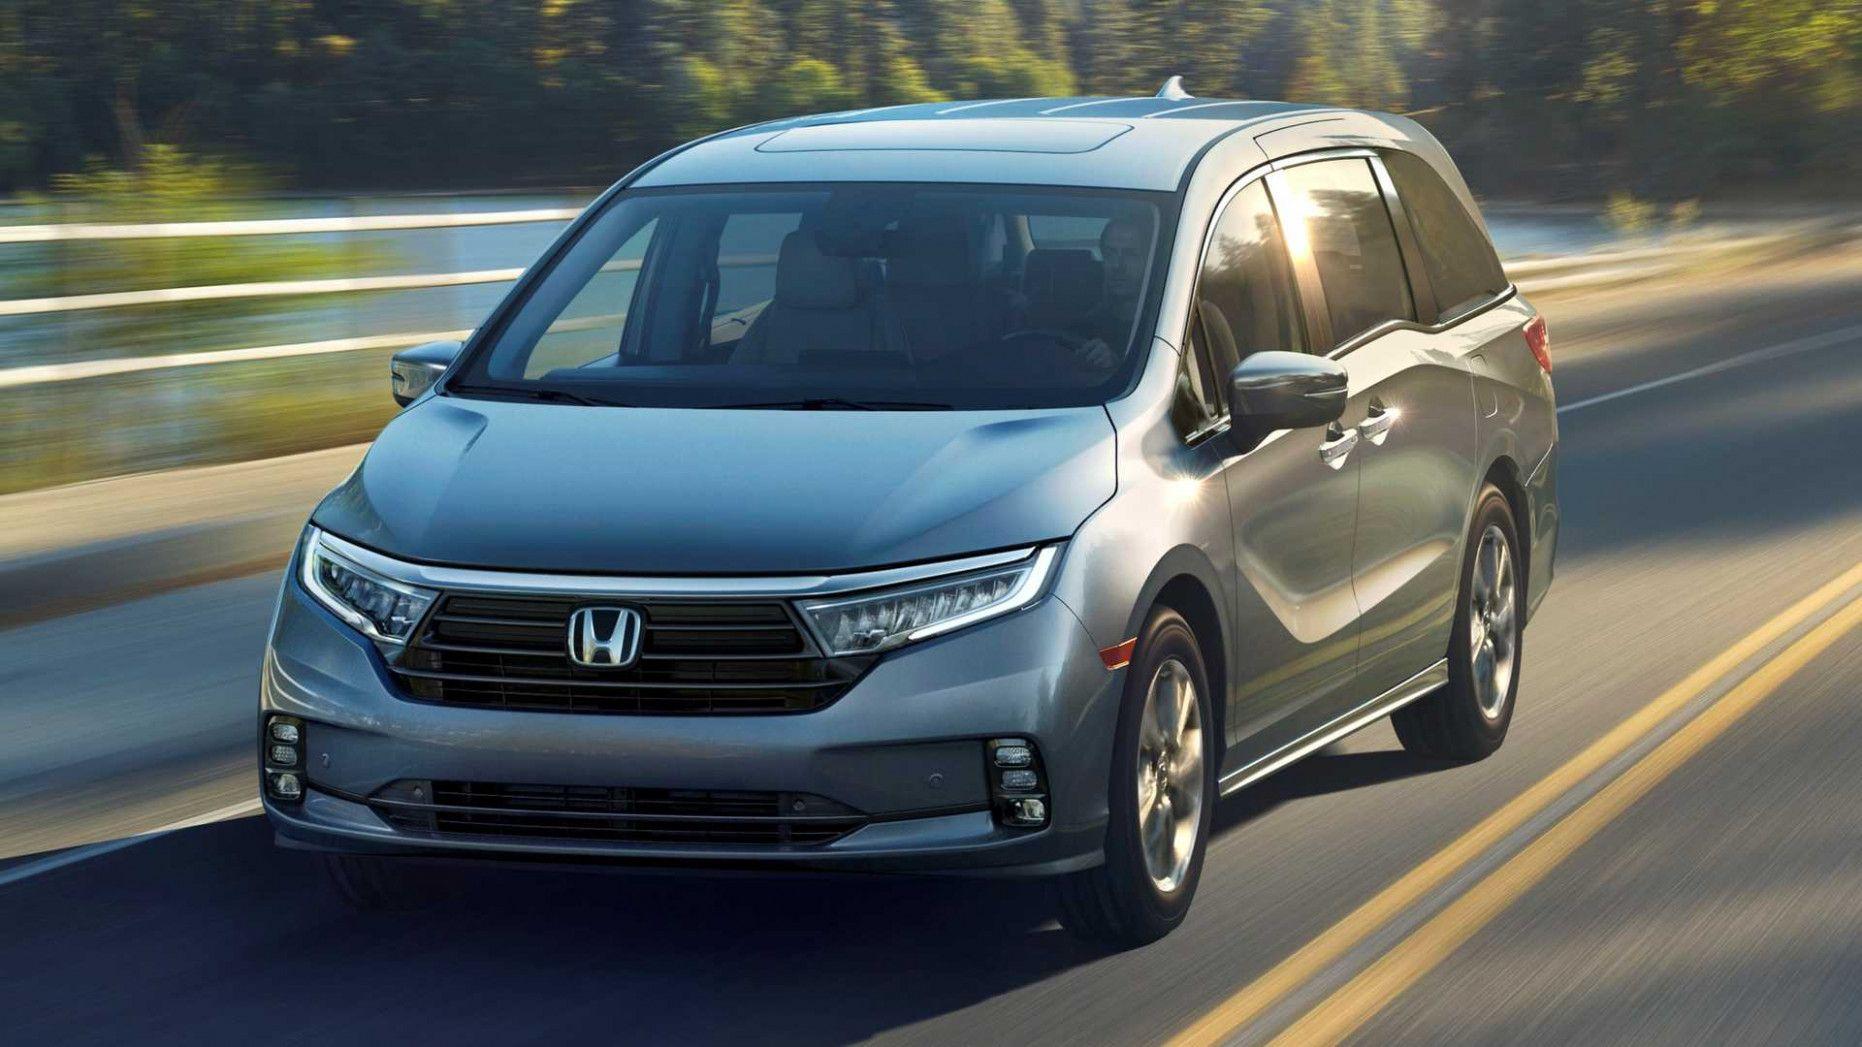 2021 Honda Crv Performance In 2020 Honda Odyssey Honda Honda Crv